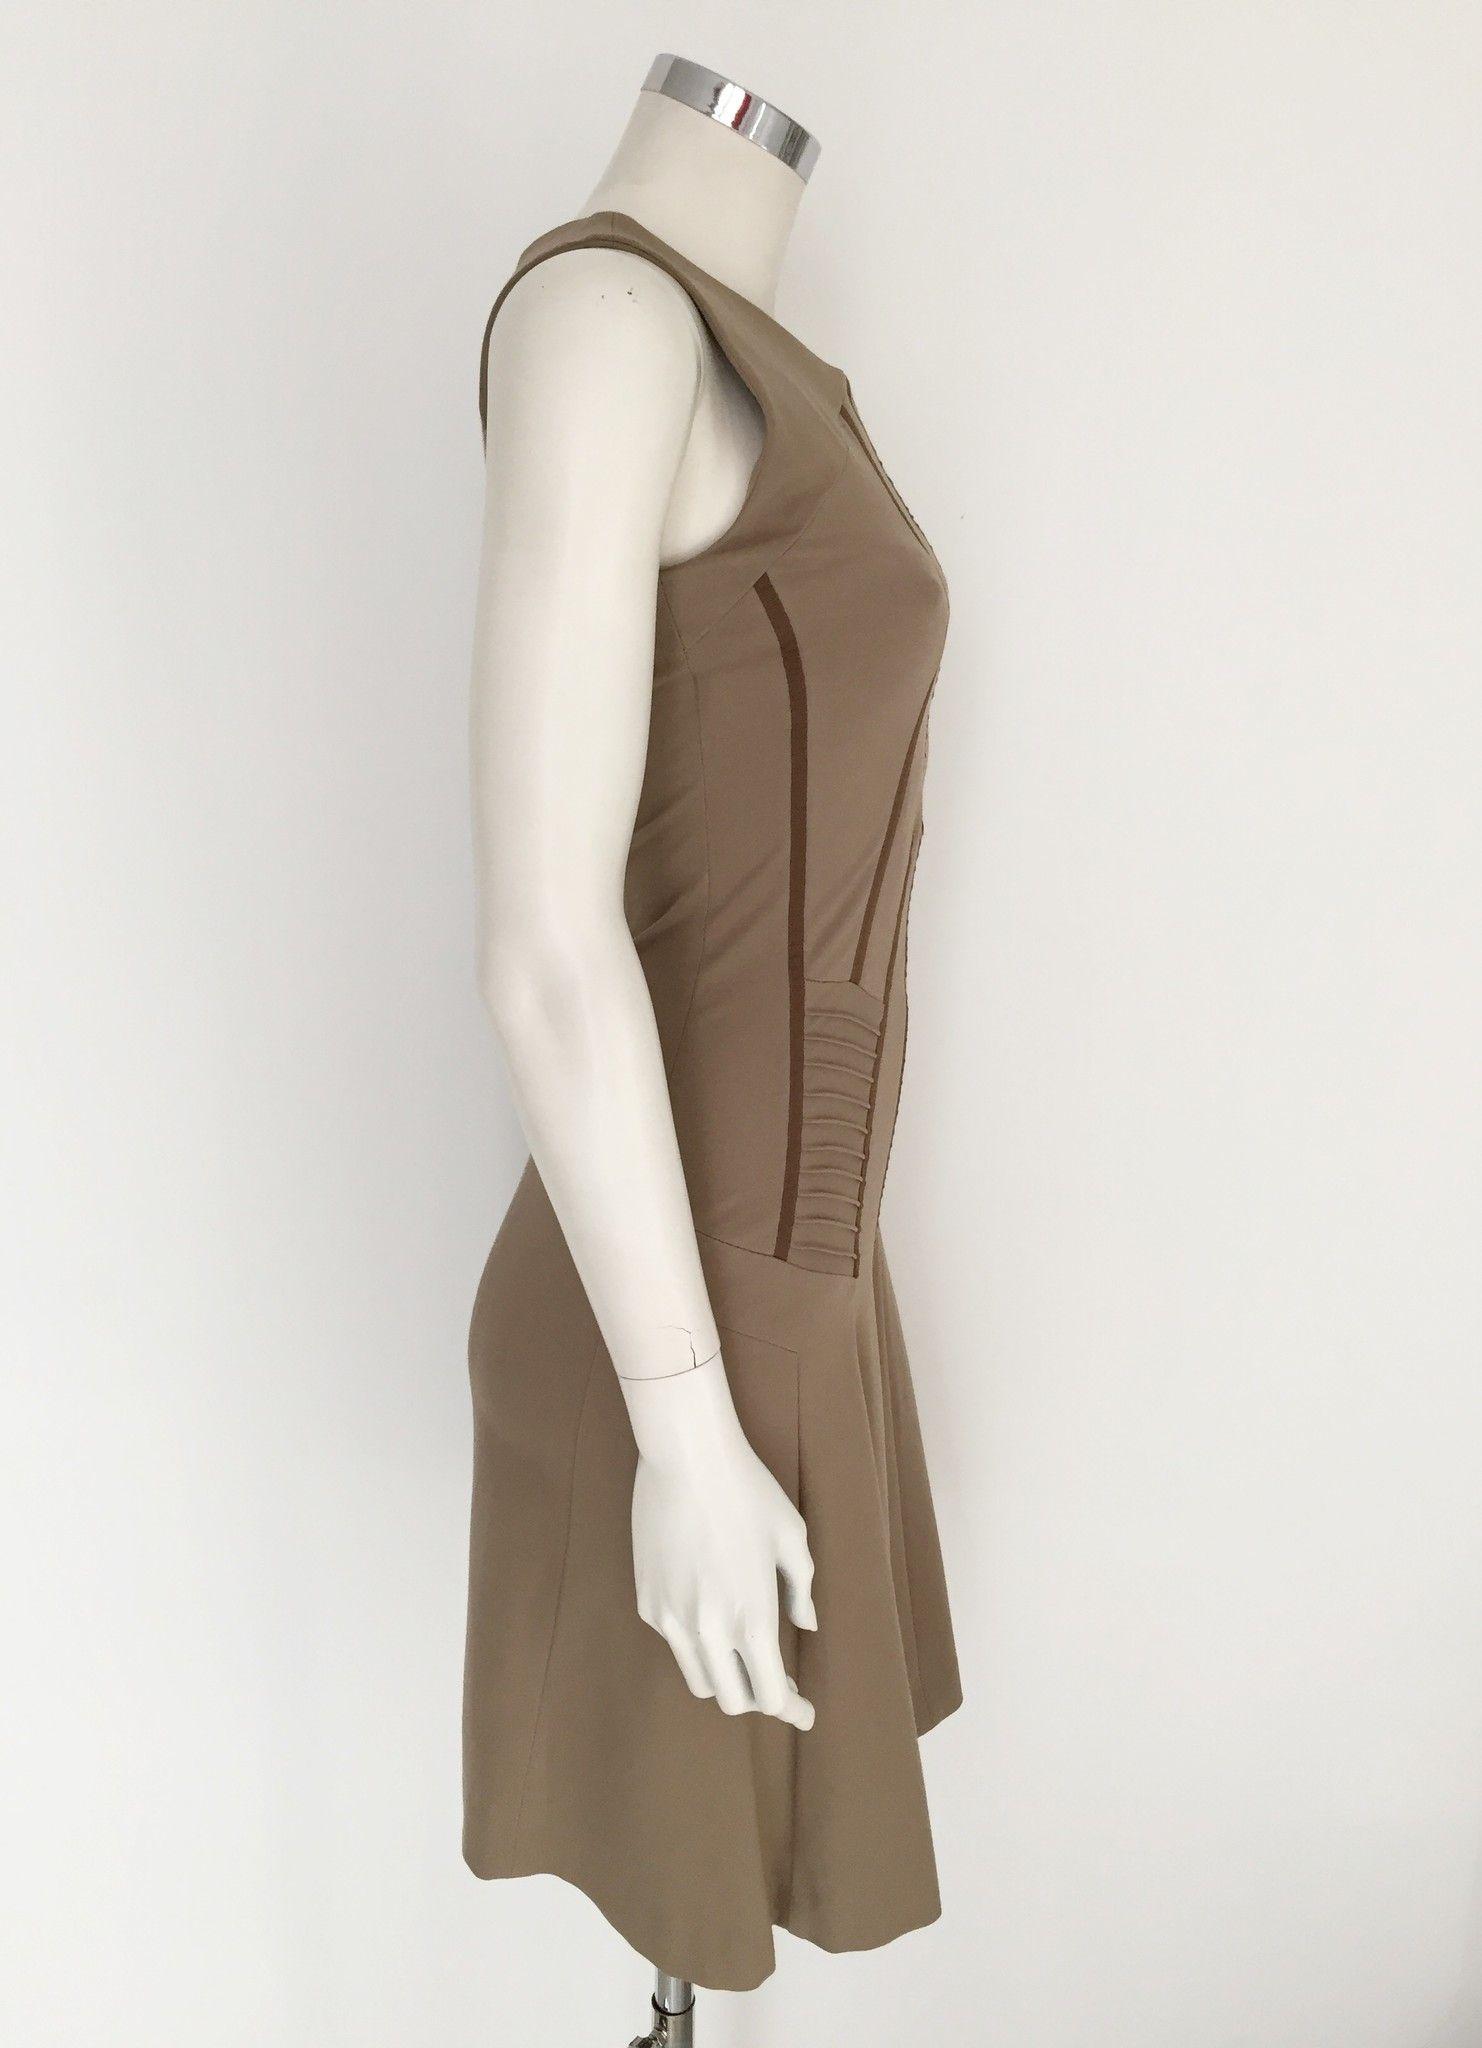 Mary Depp Sleeveless dress and Flared Cod.30135